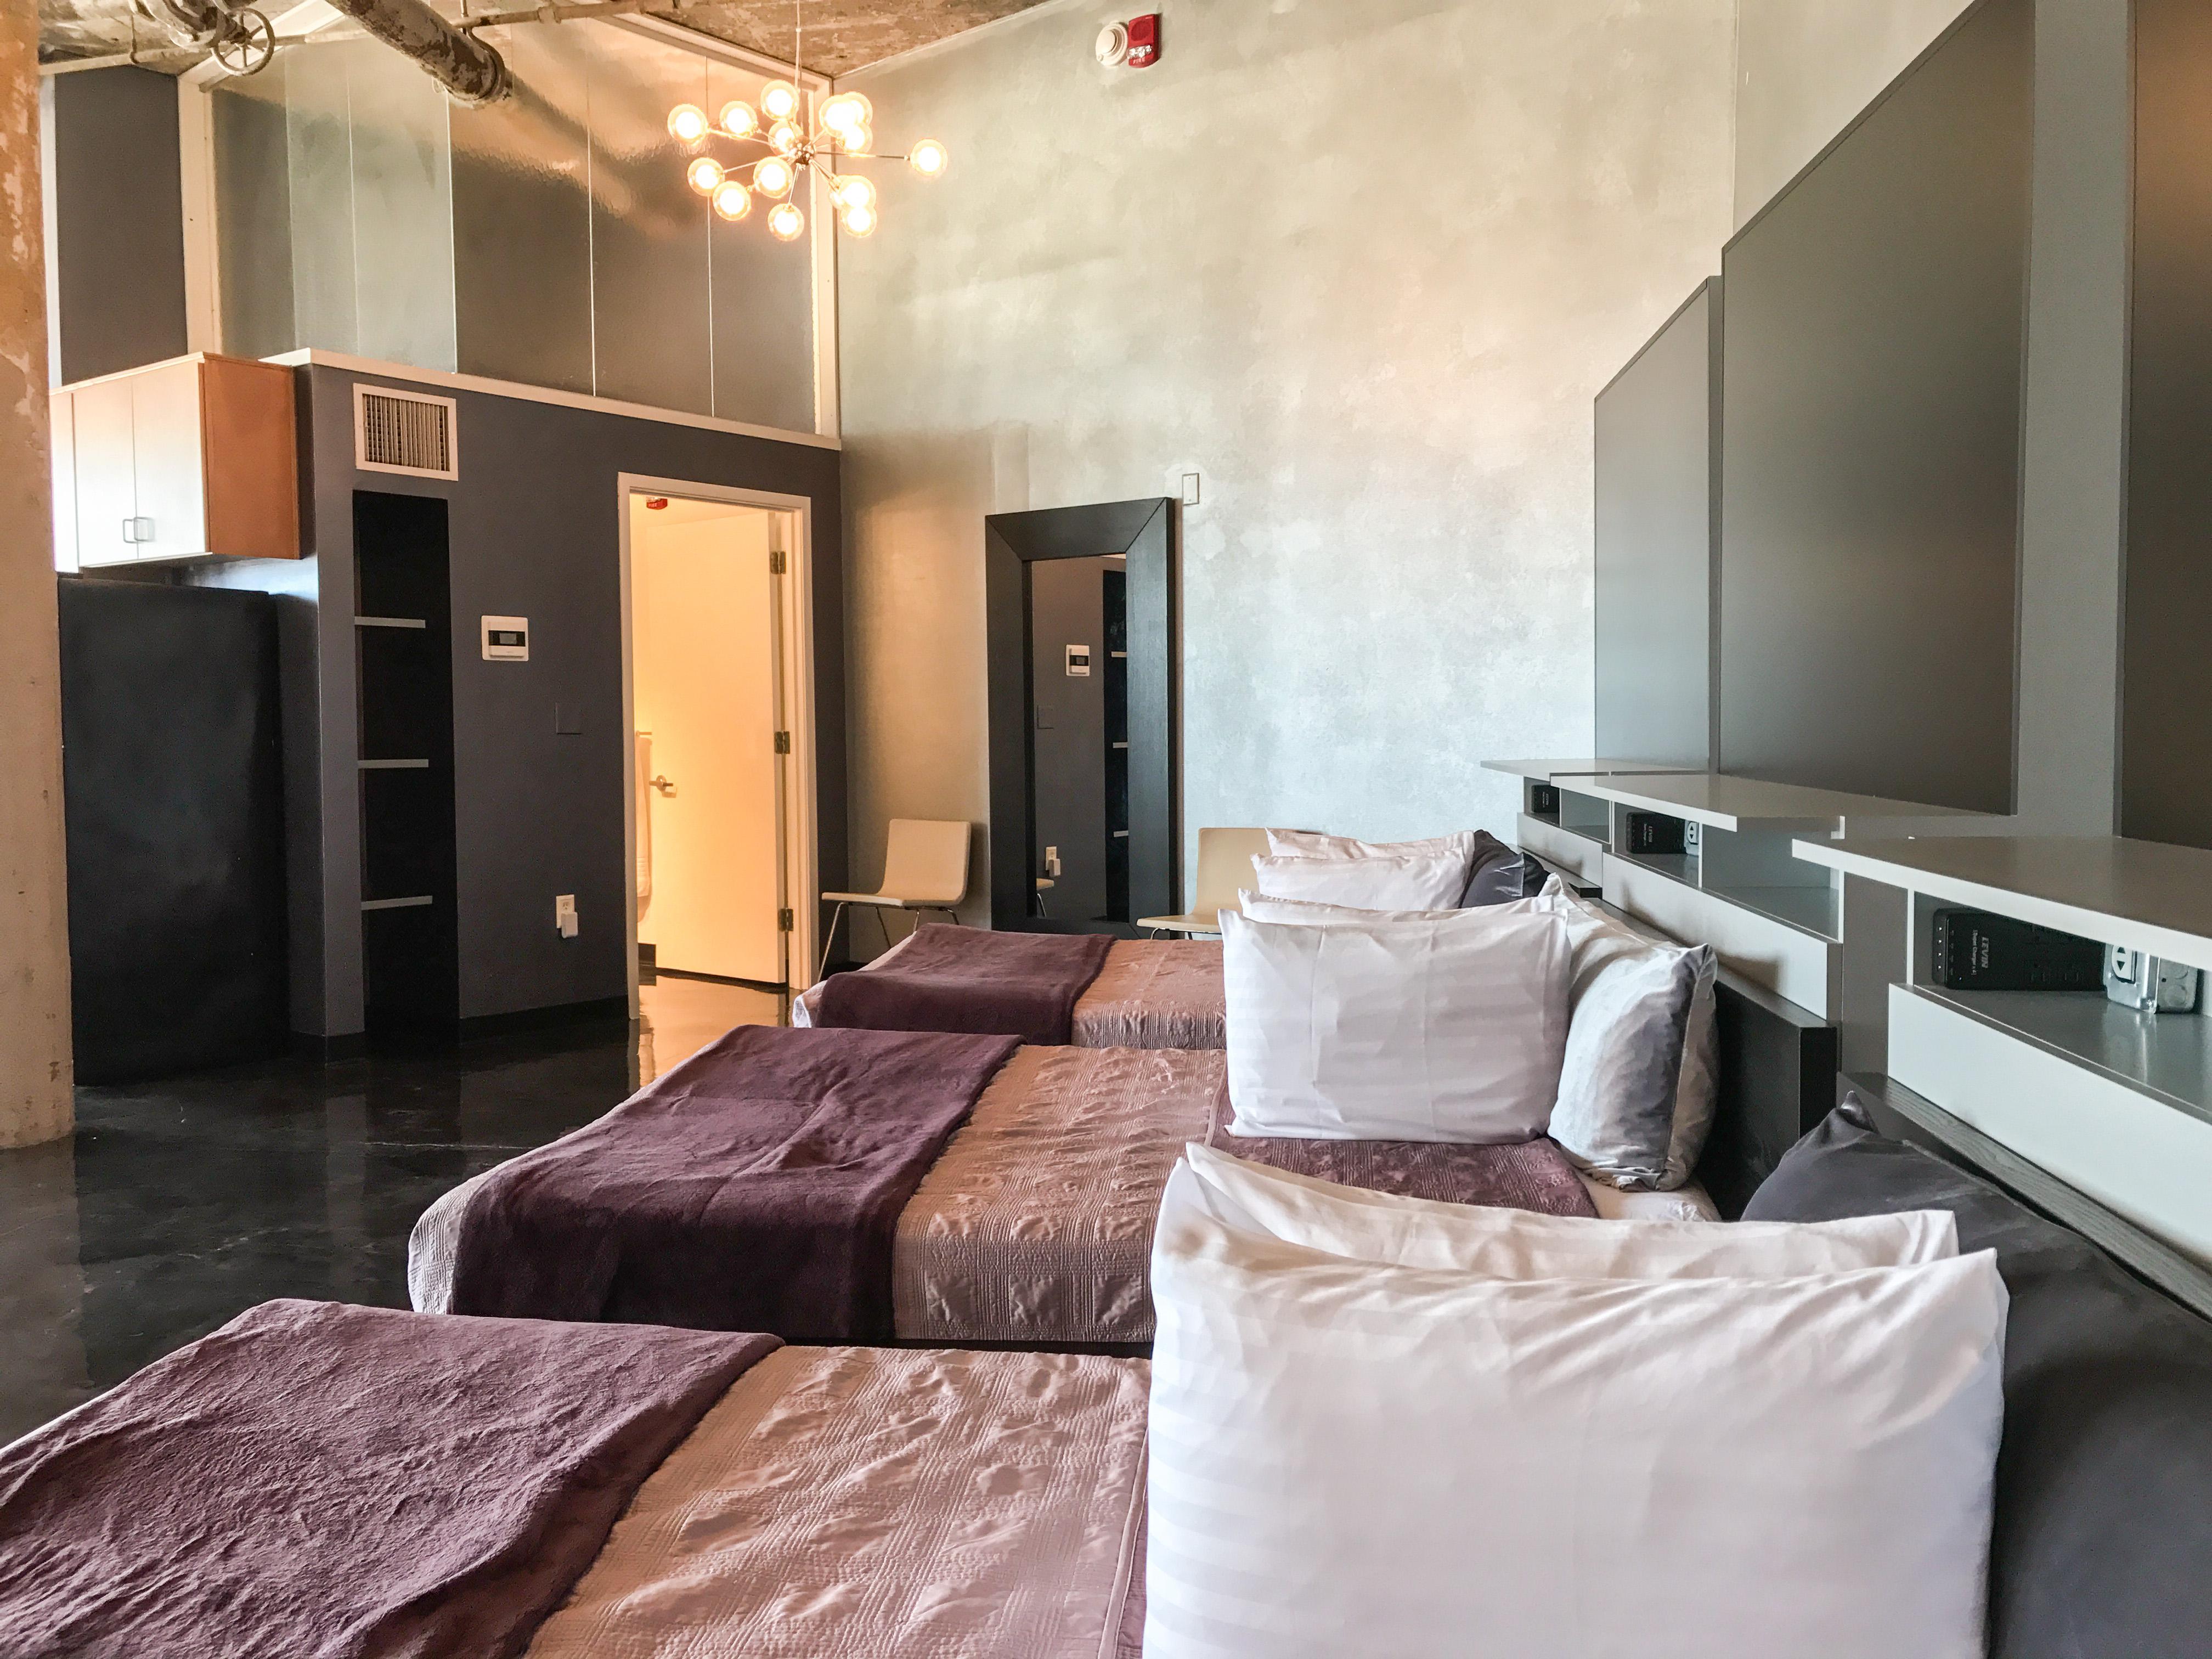 Loft Reverie Hotel 804 - Zbeds + Queen Foam Topped Matress